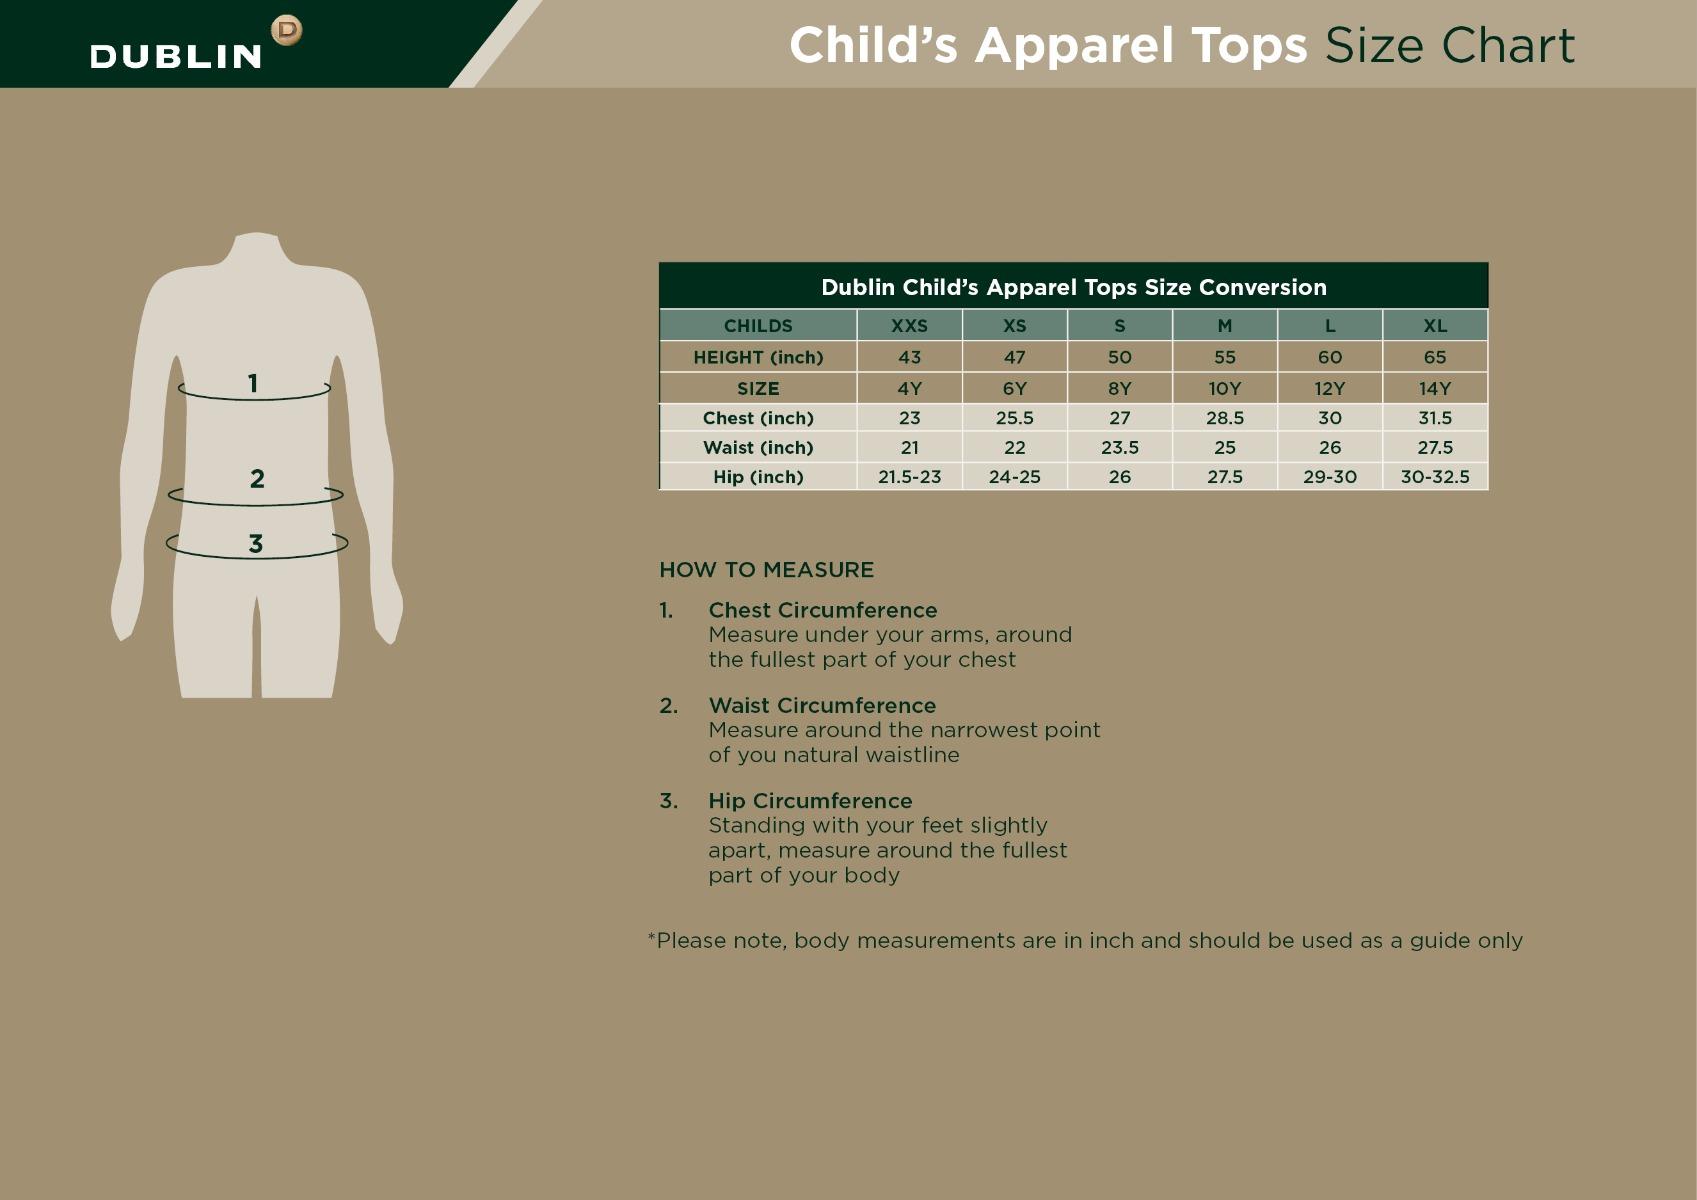 Children's Apparel Size Guide